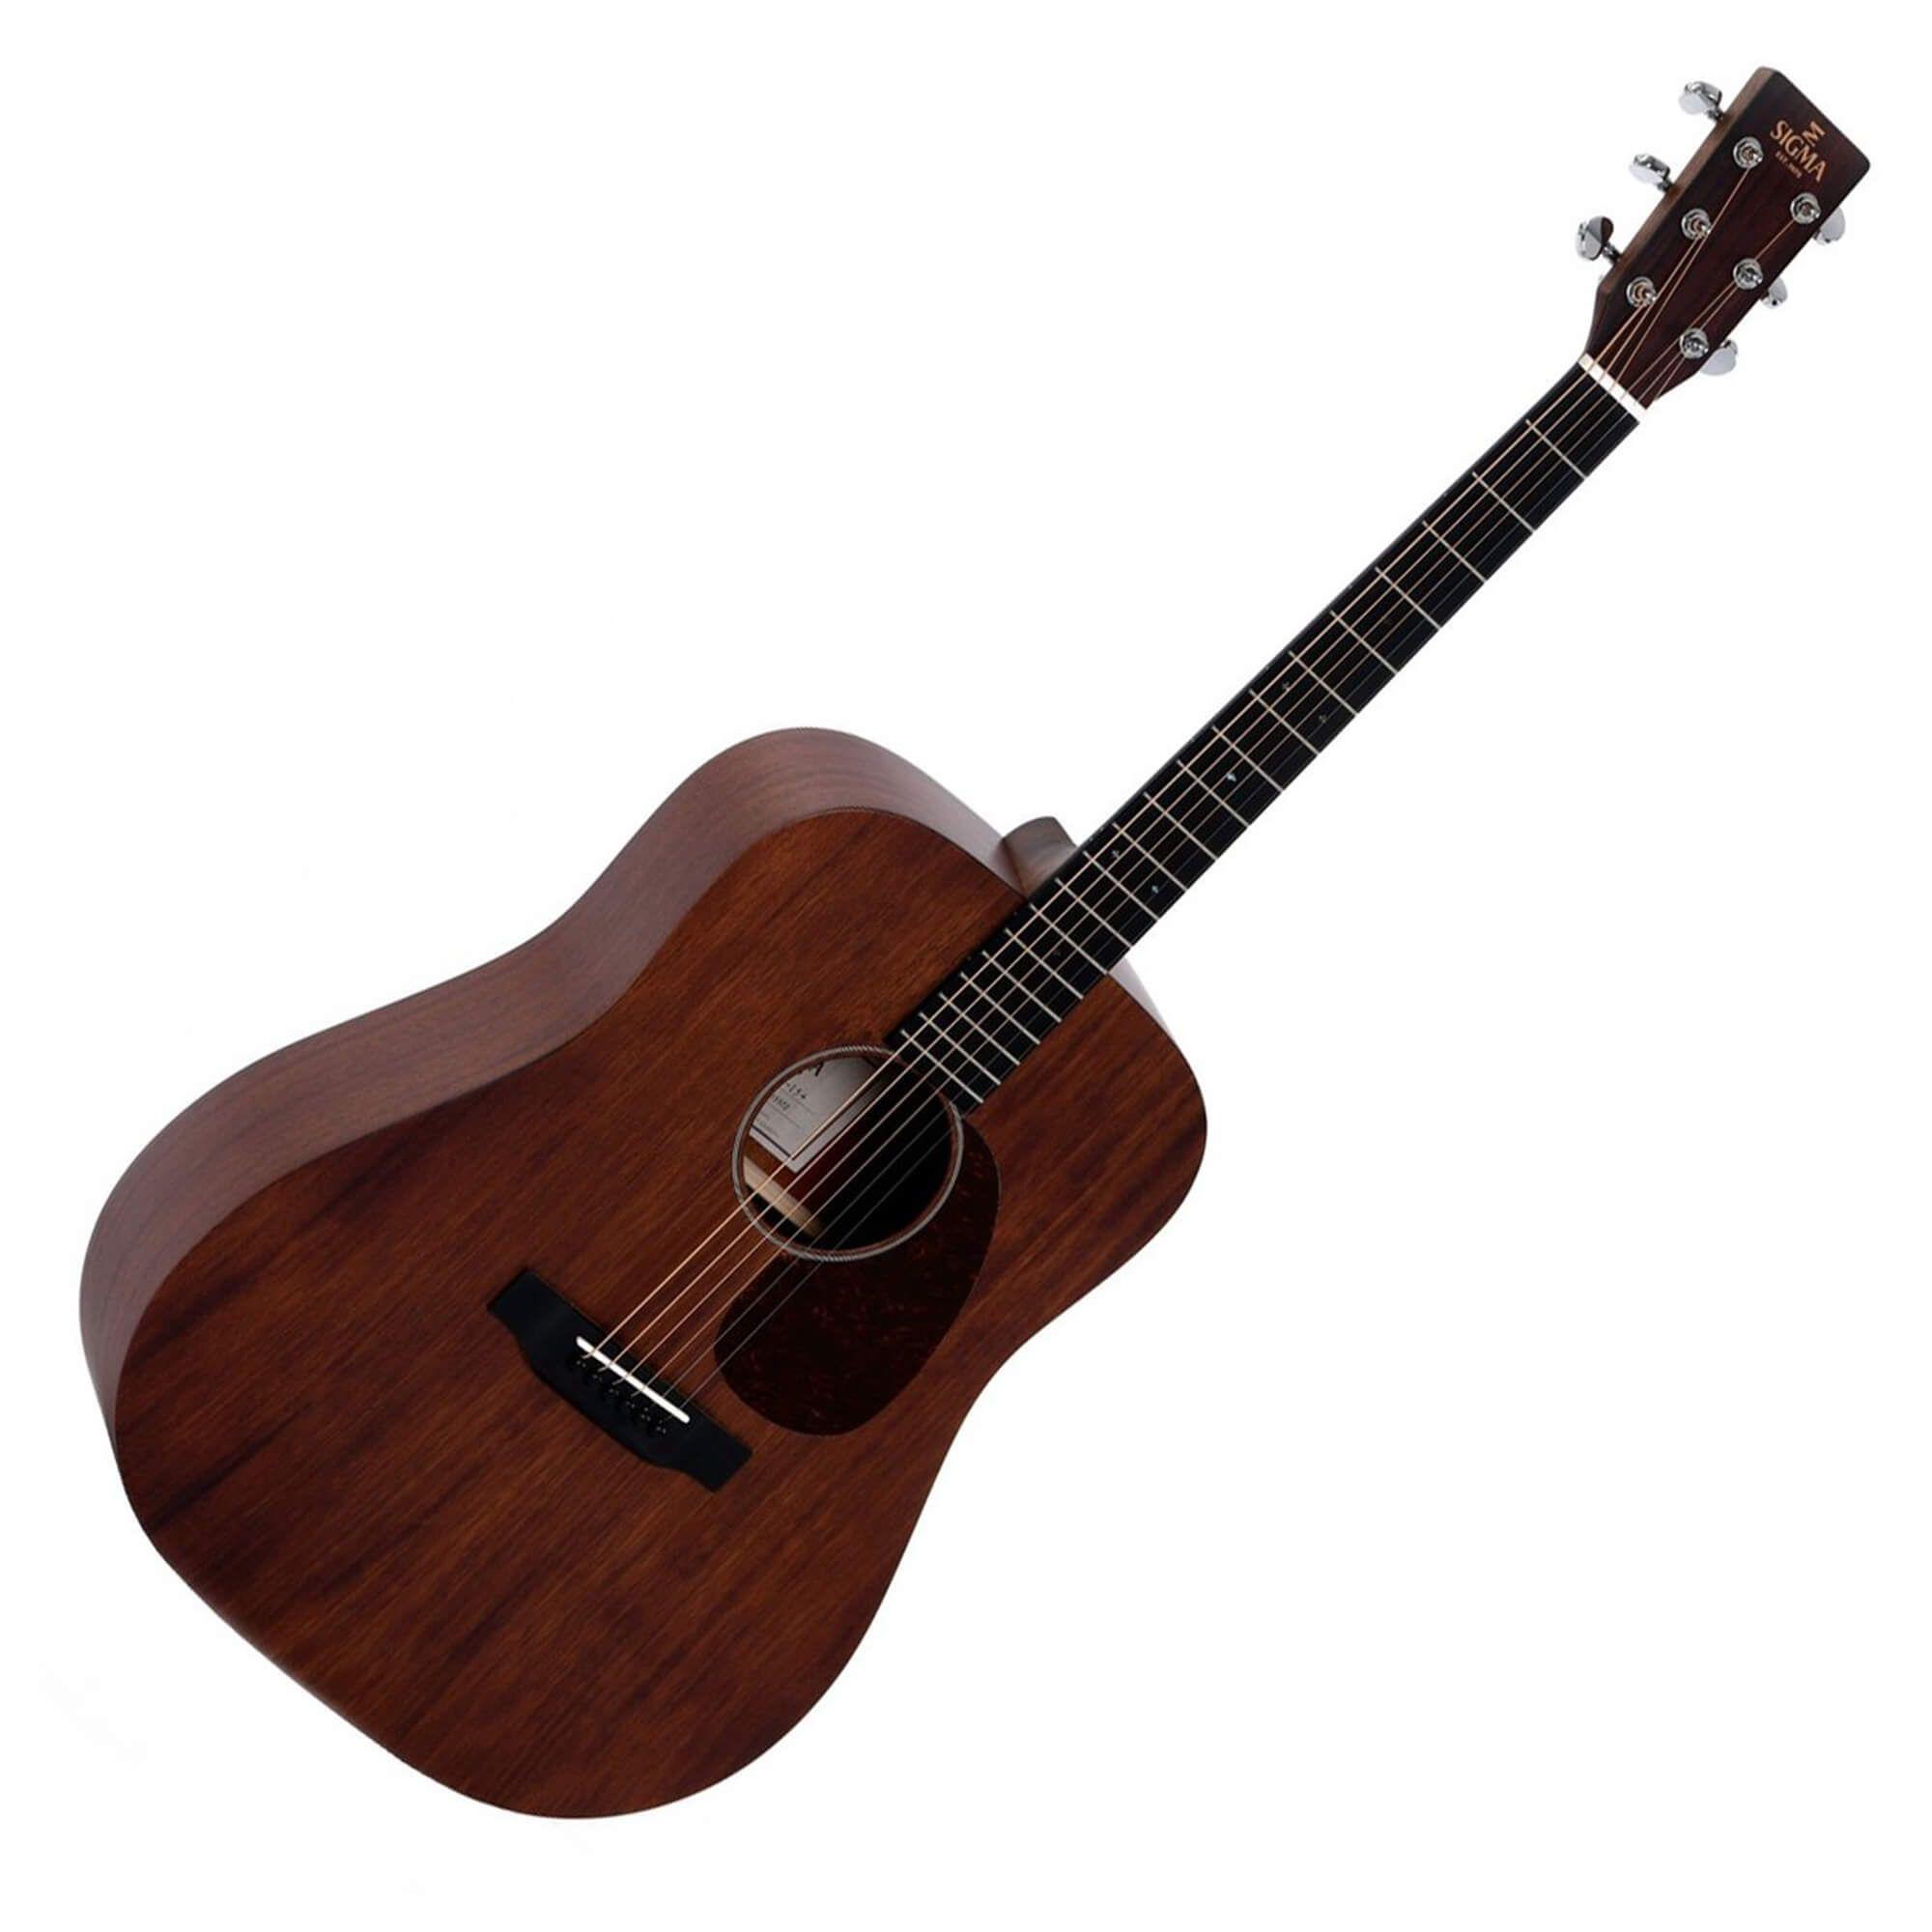 Sigma 15 Series DM-15 Acoustic Guitar